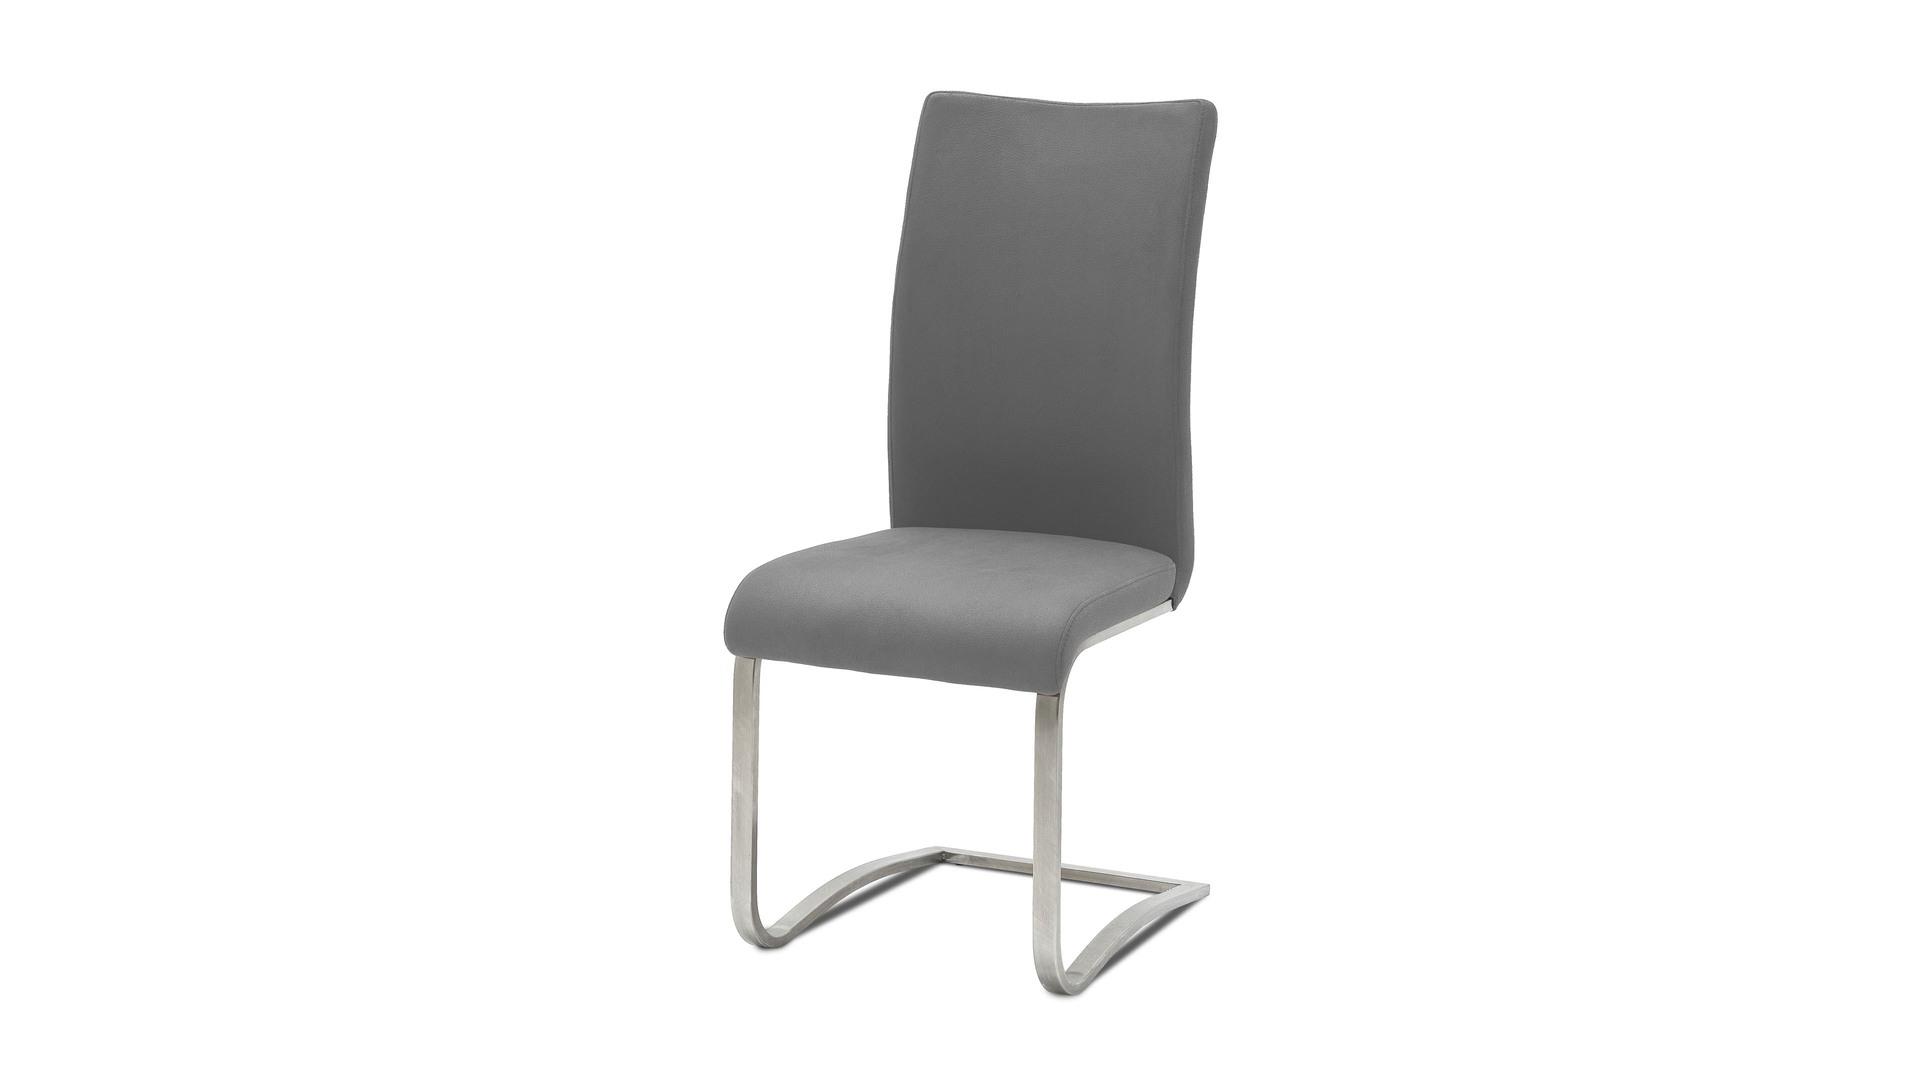 Leder-Schwingstuhl, ein Dielenmöbel oder Büromöbel